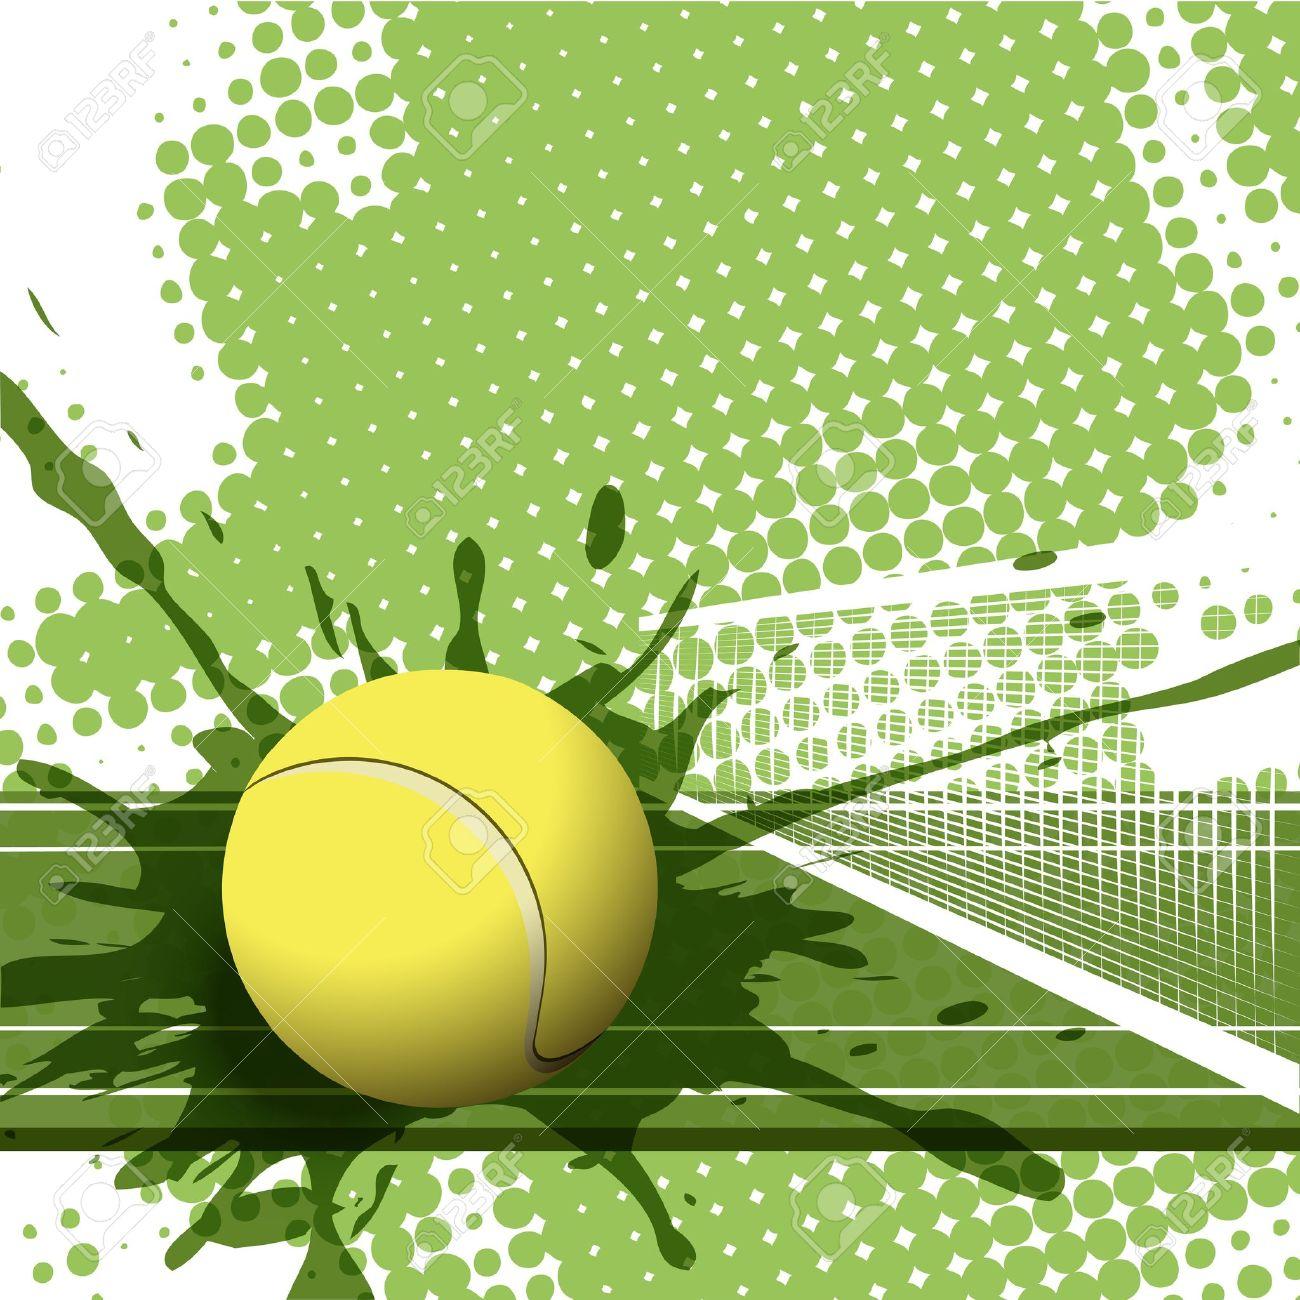 tennis: illustration tennis ball on abst-tennis: illustration tennis ball on abstract green background-7